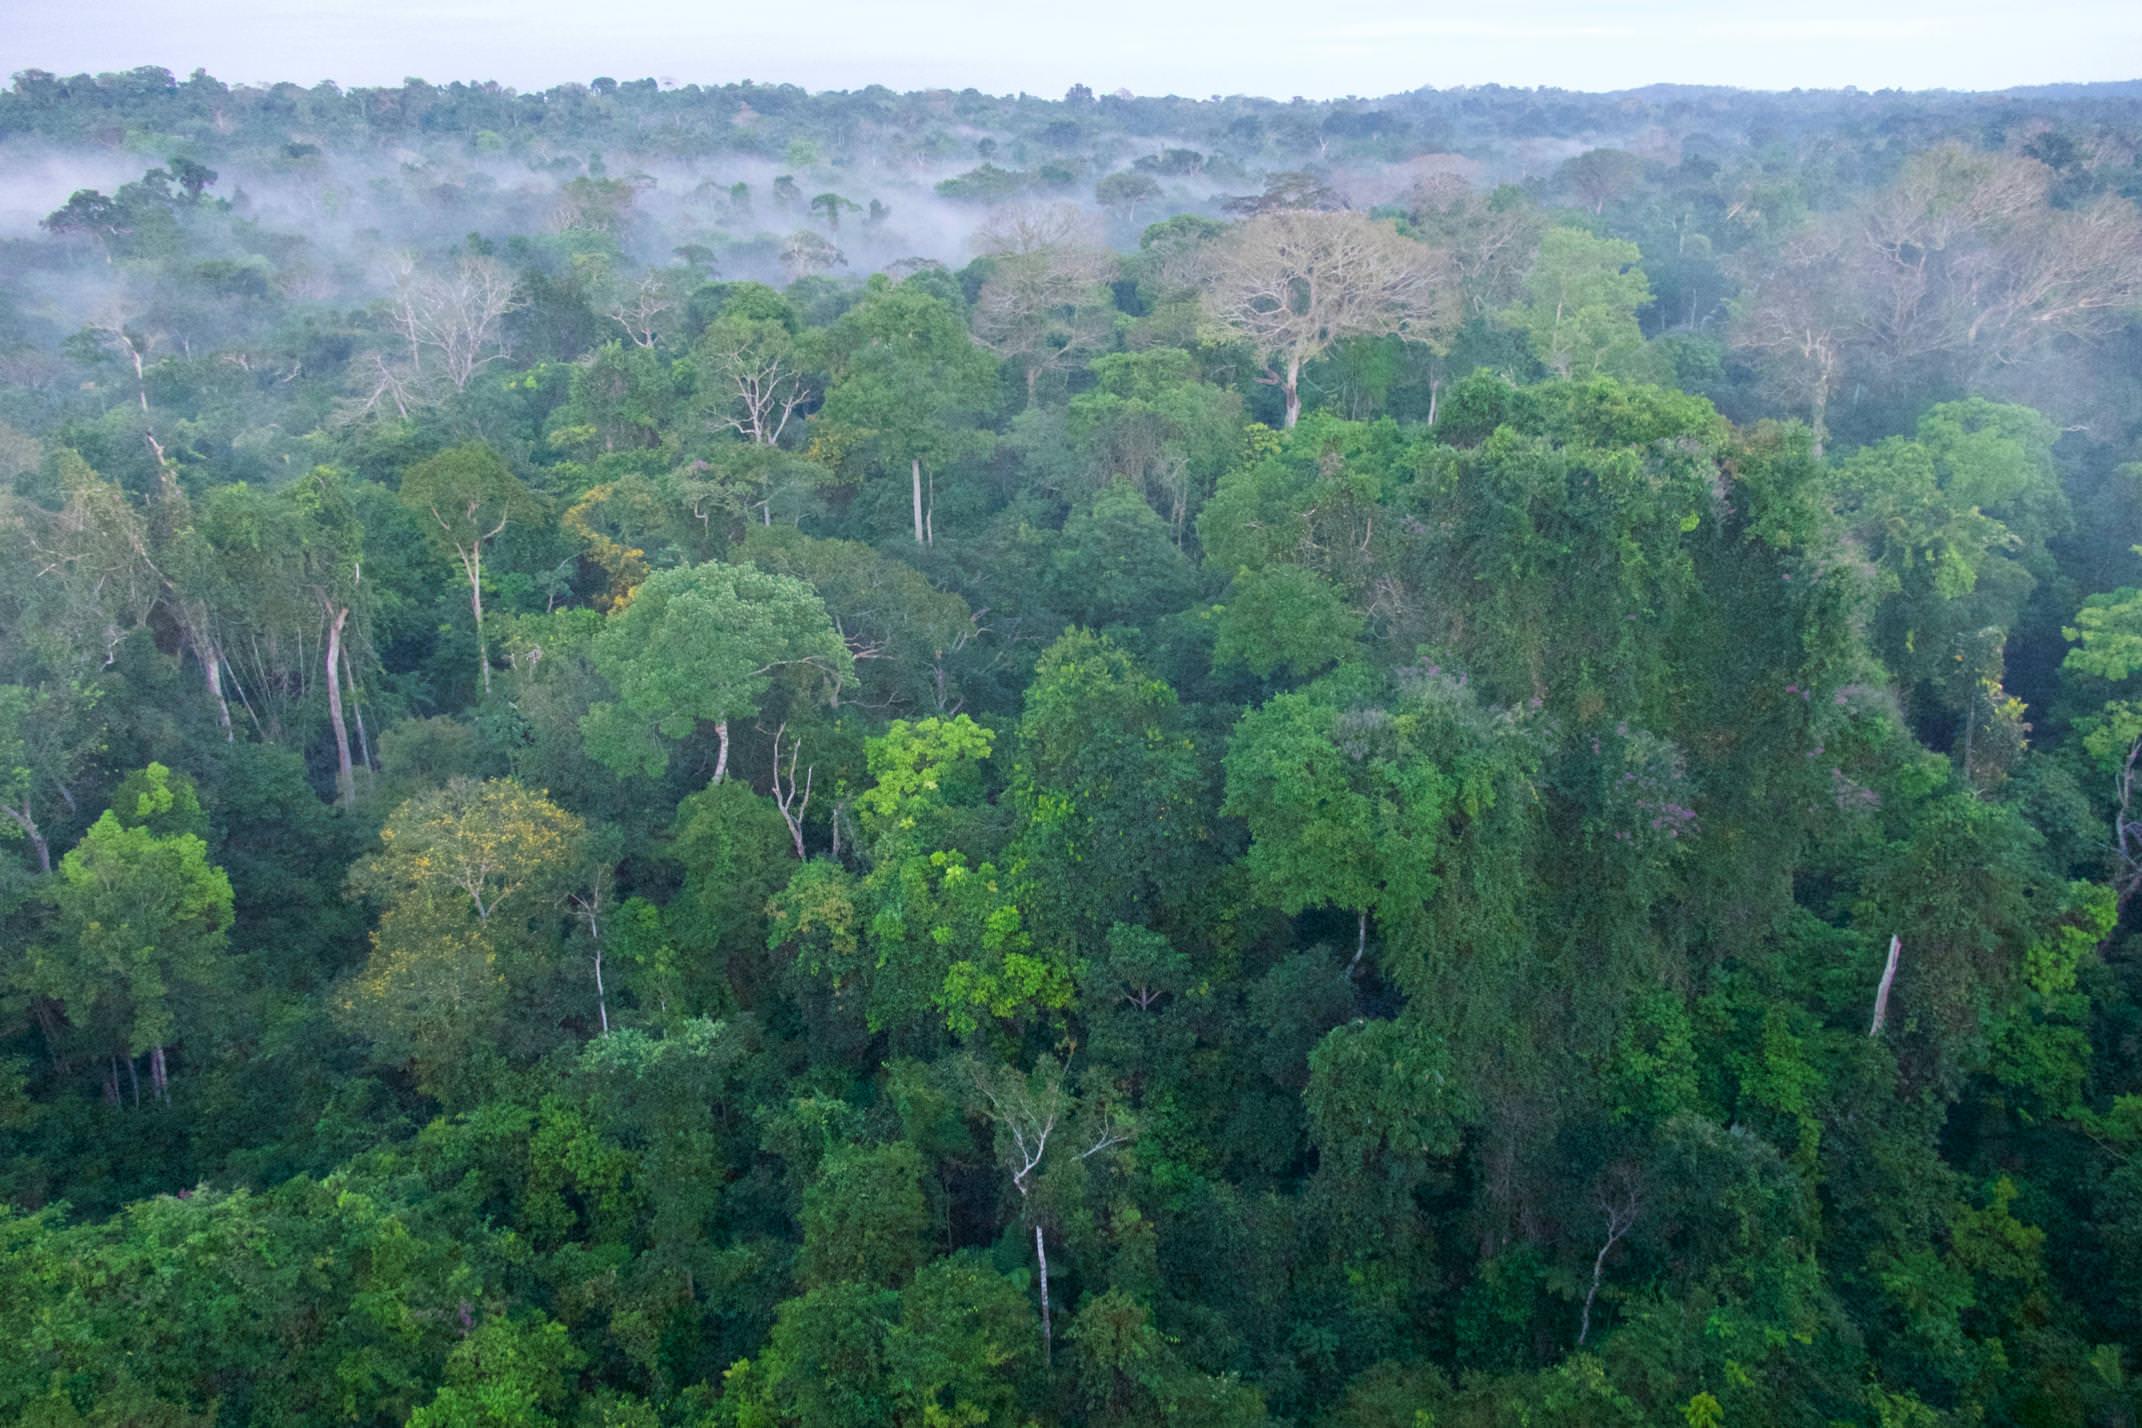 Brazil amazon cristalino lodge early light on forest canopy copyright thomas power pura aventura